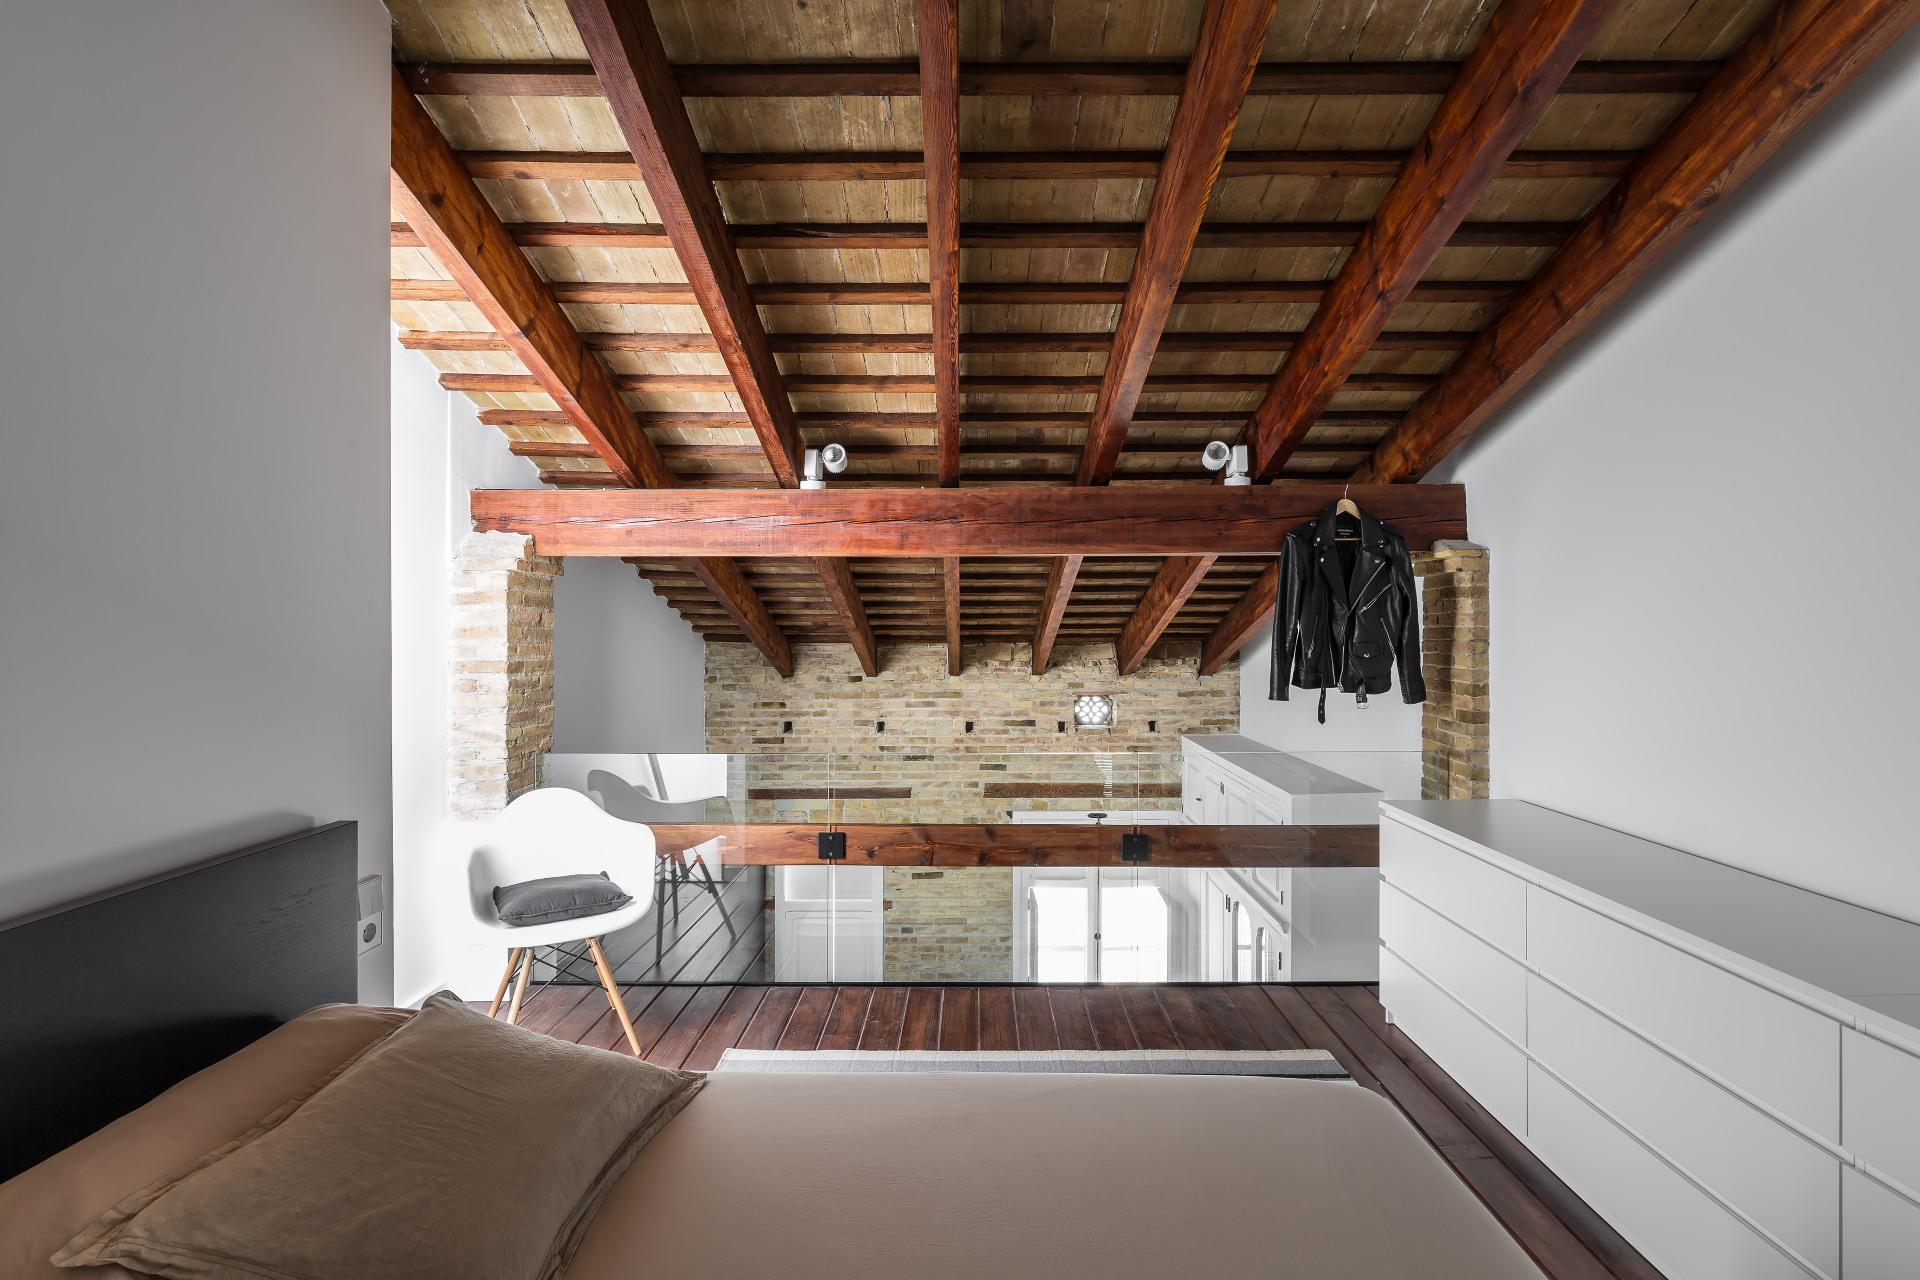 fotografia-arquitectura-valencia-german-cabo-ambau-cabanyal (24)